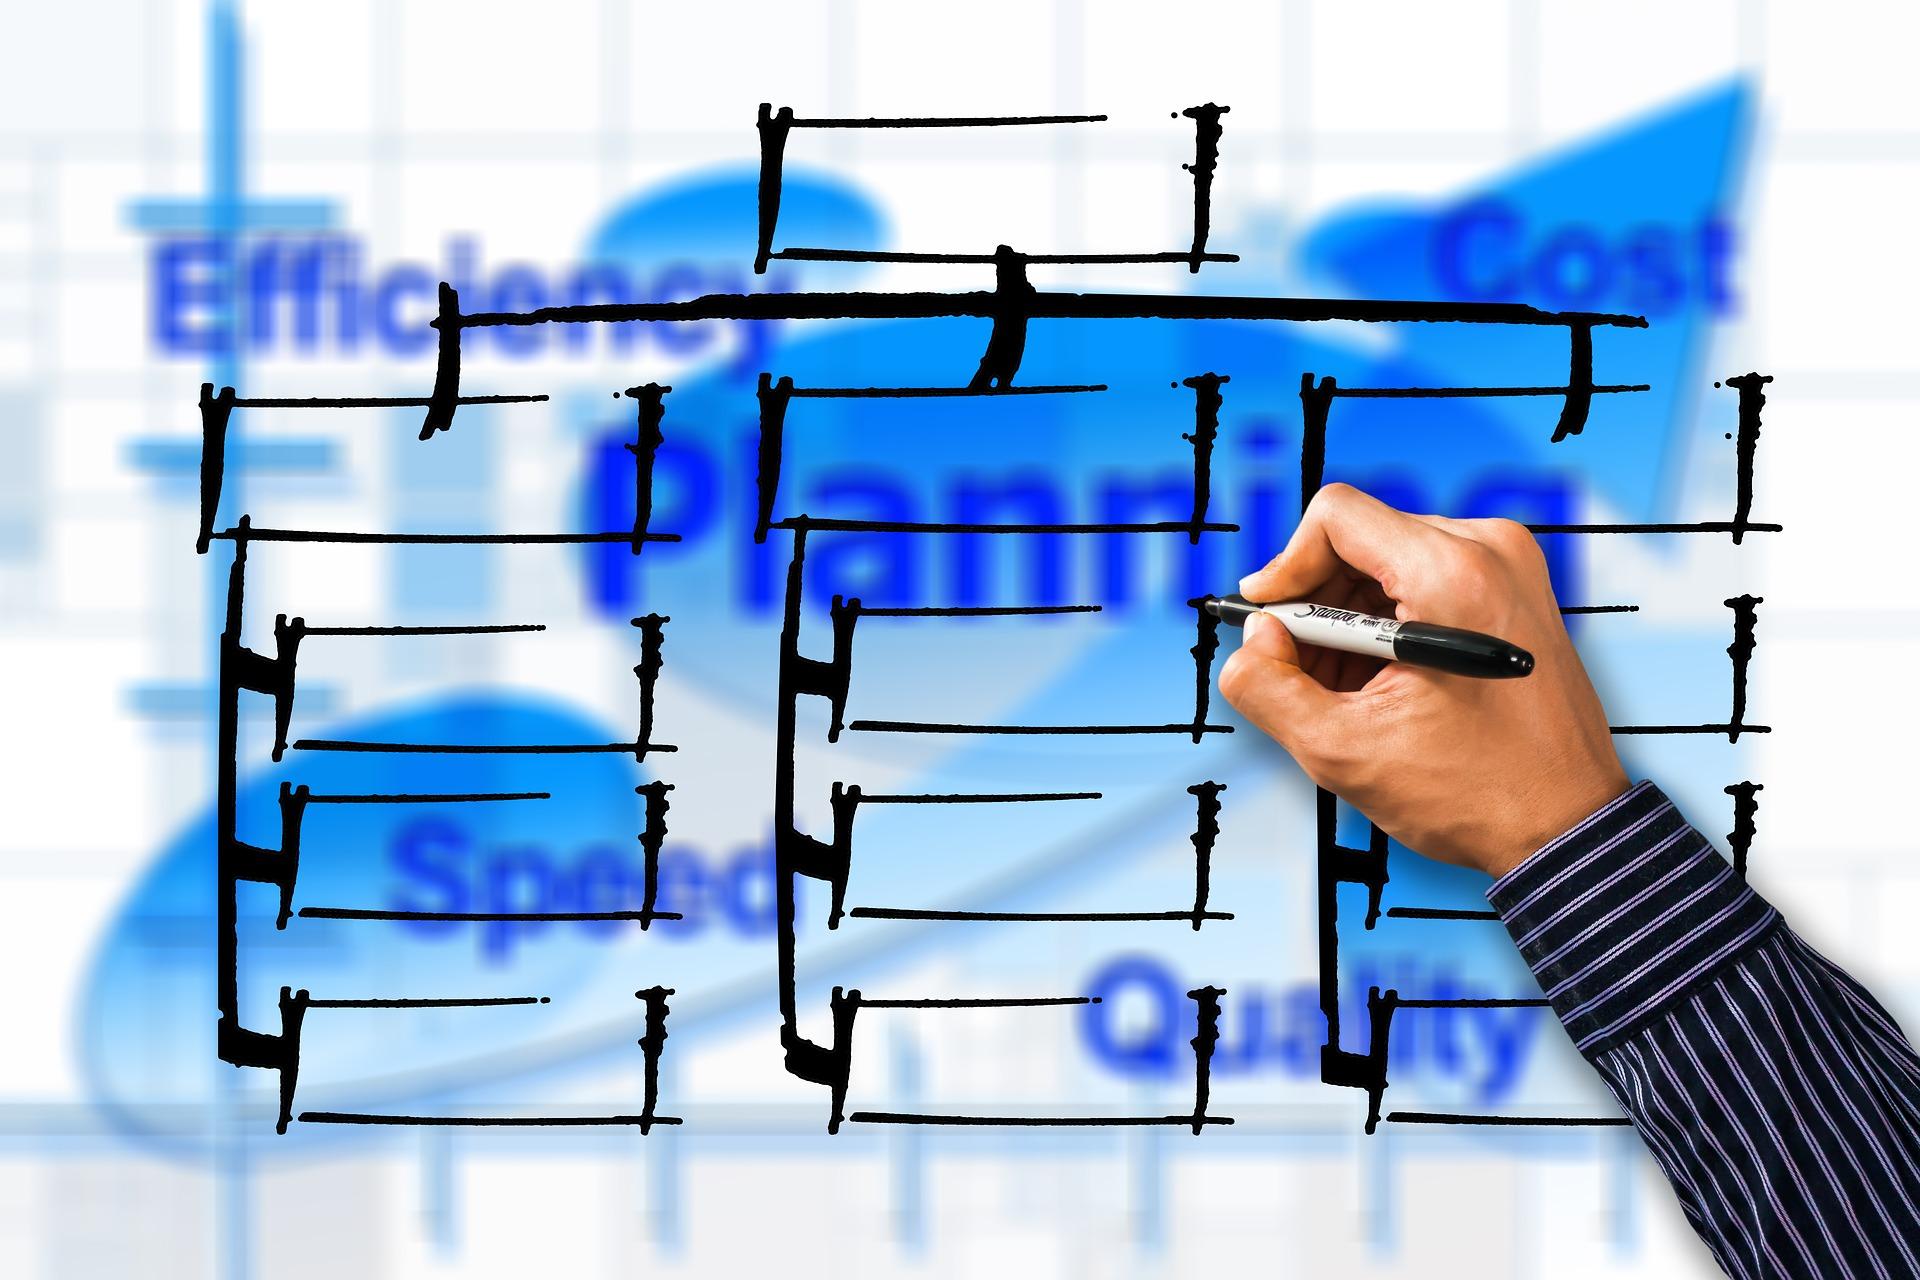 【QC7つ道具】問題解決の分析手法【製造業以外にも有効です】